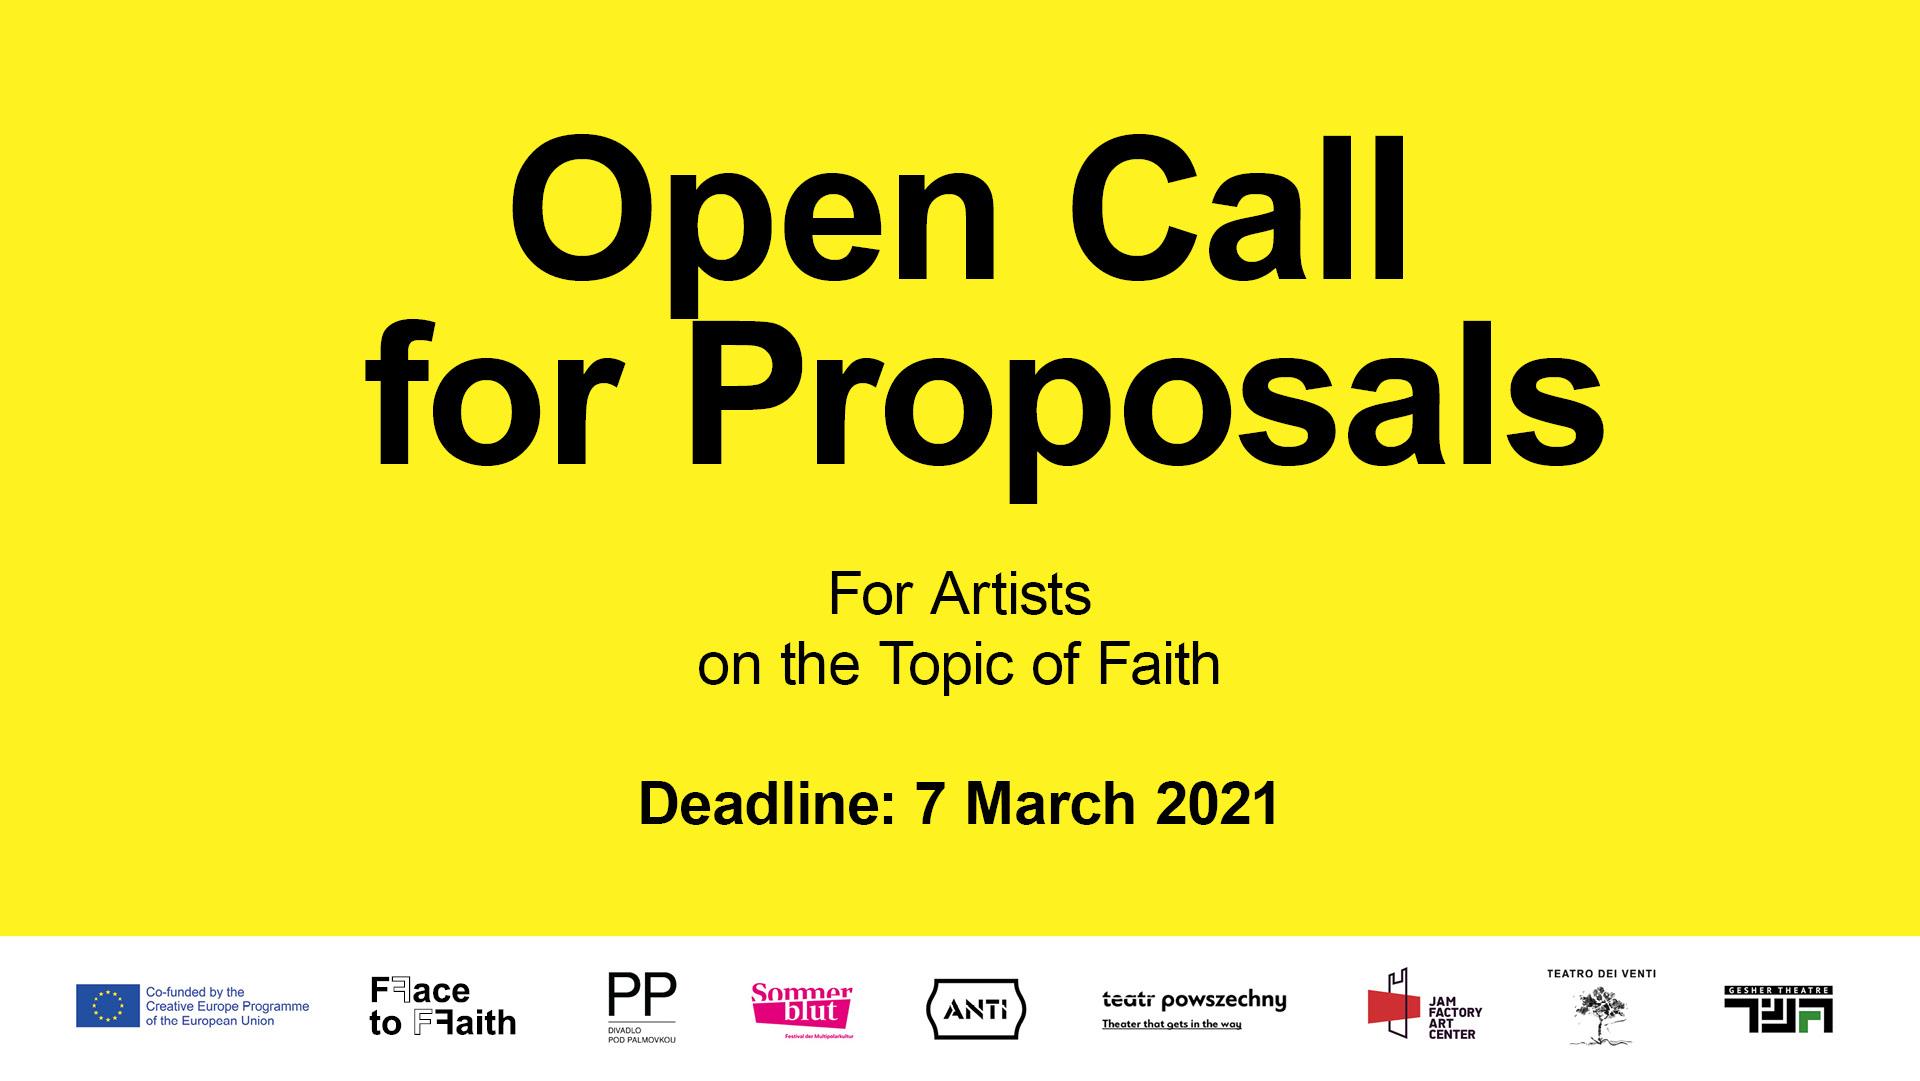 výzva face for faith pre umelcov